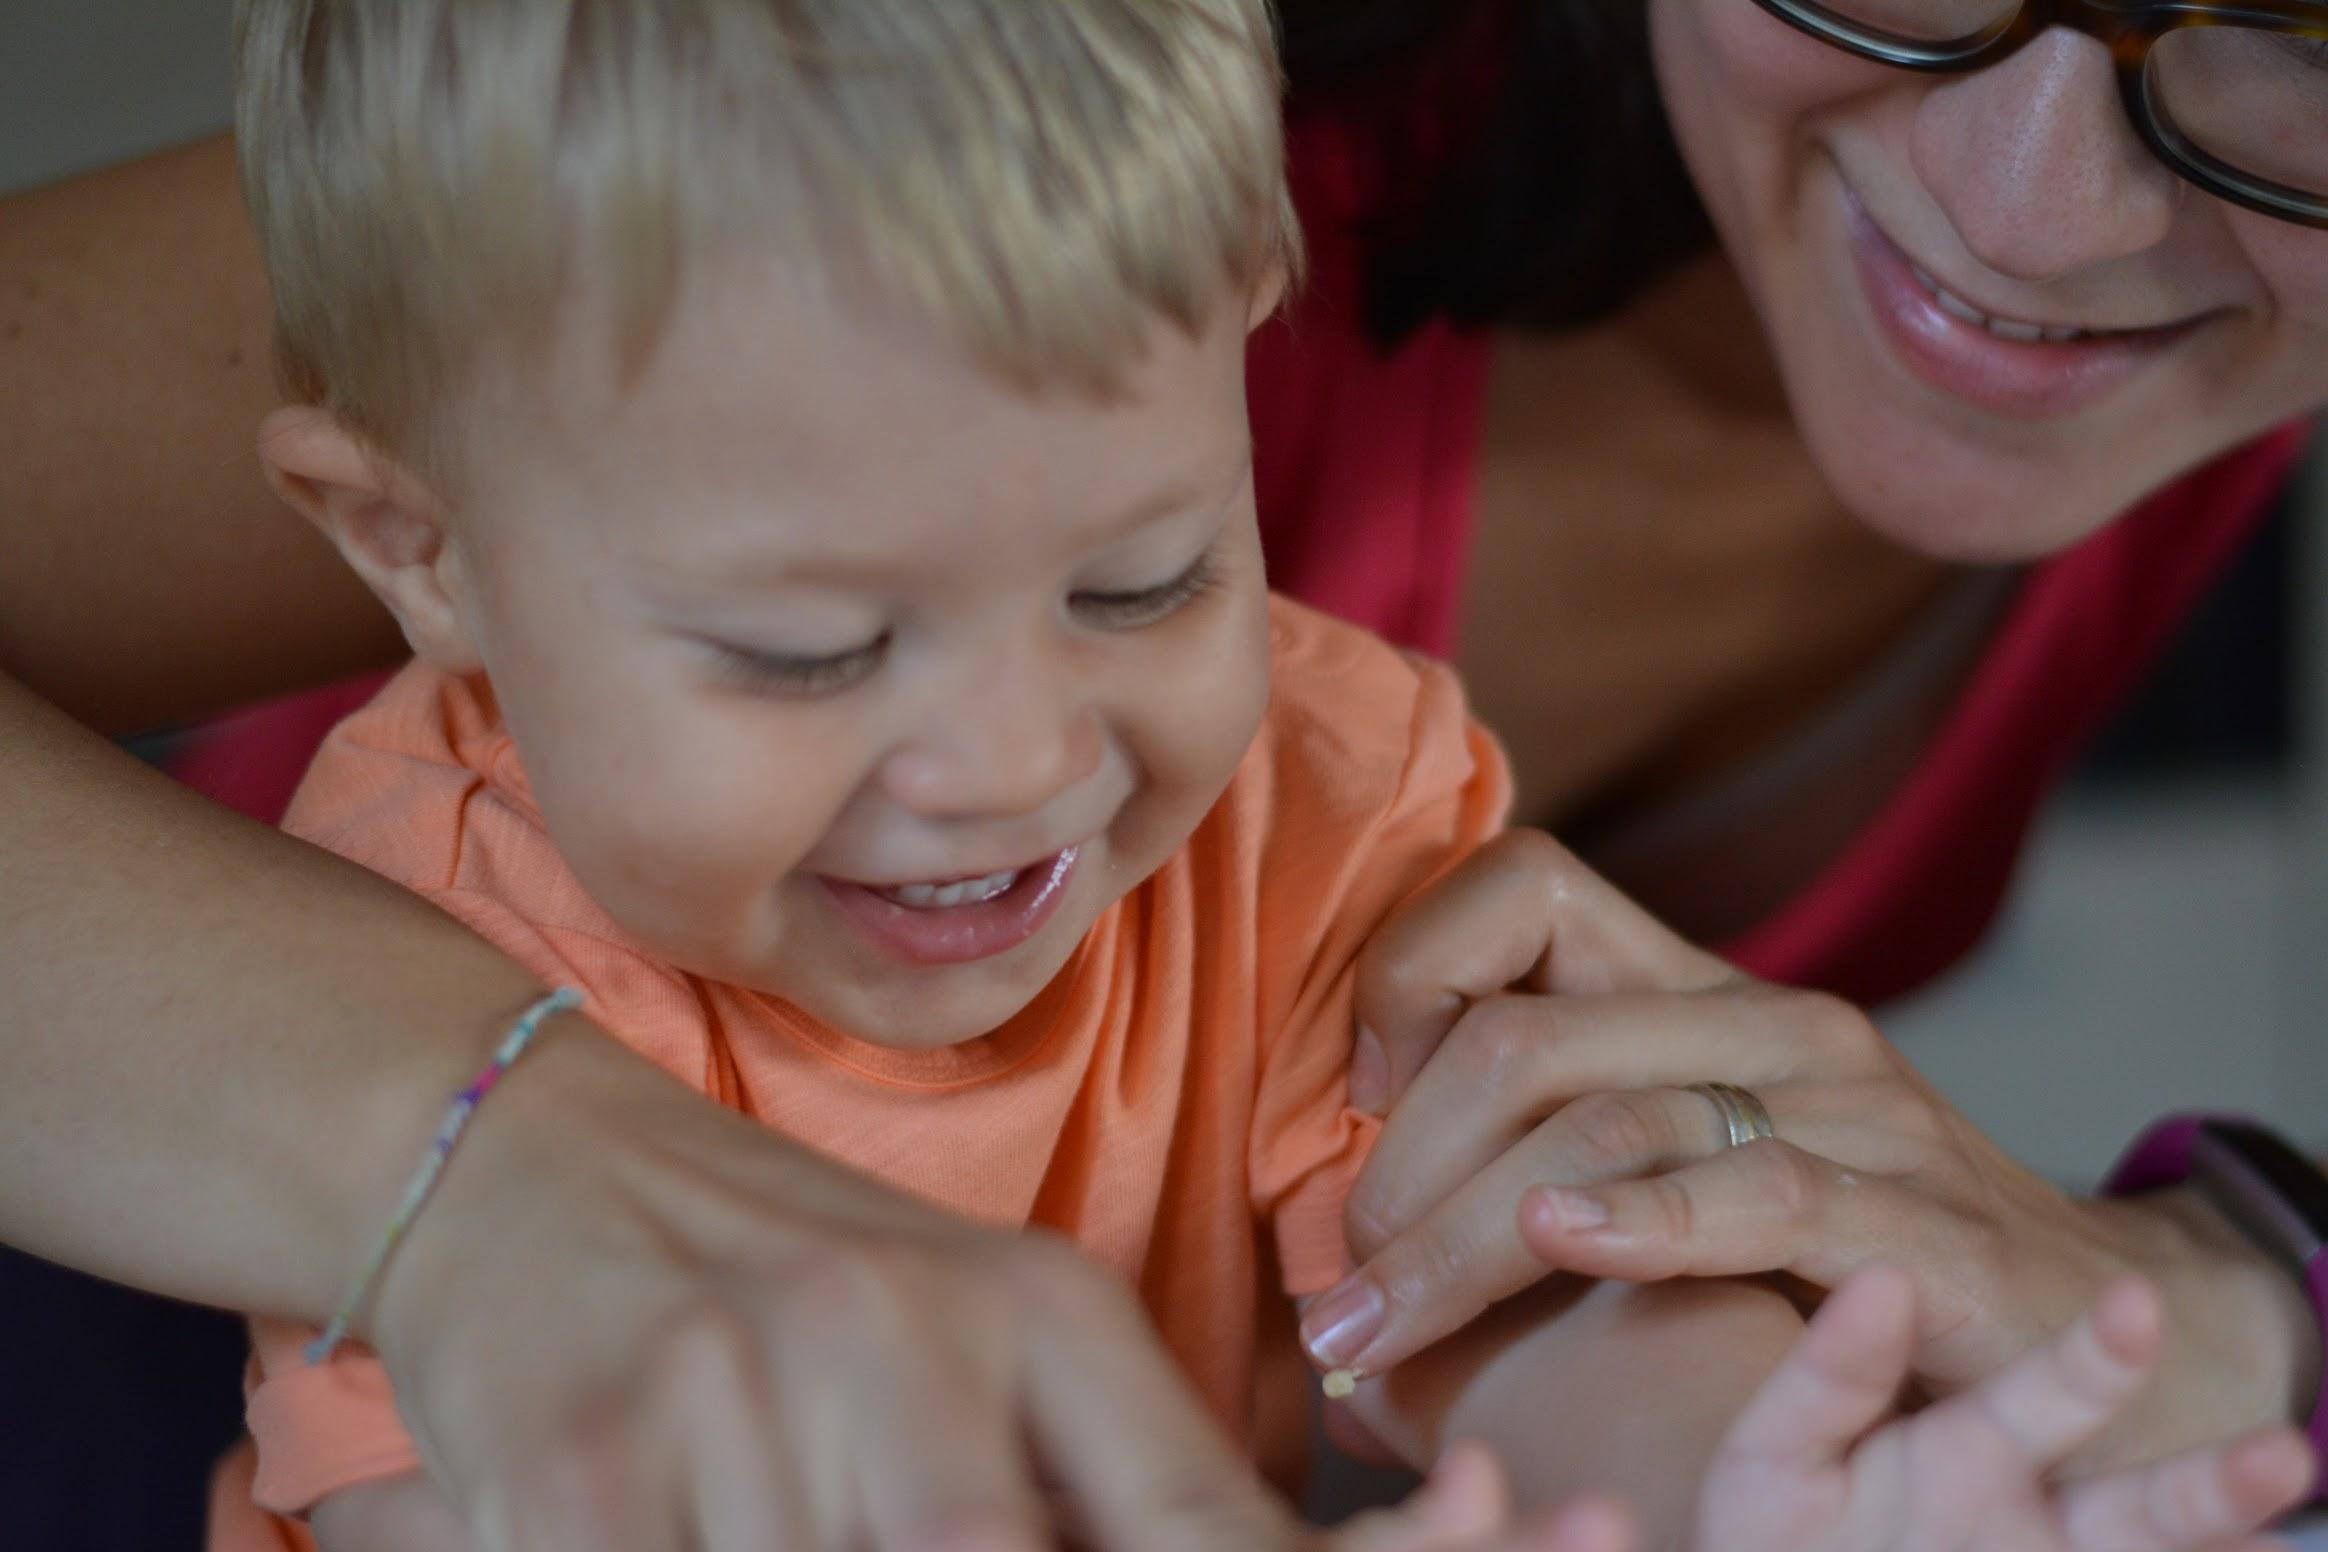 learning tower bianconiglio kids complicità adulto bambino